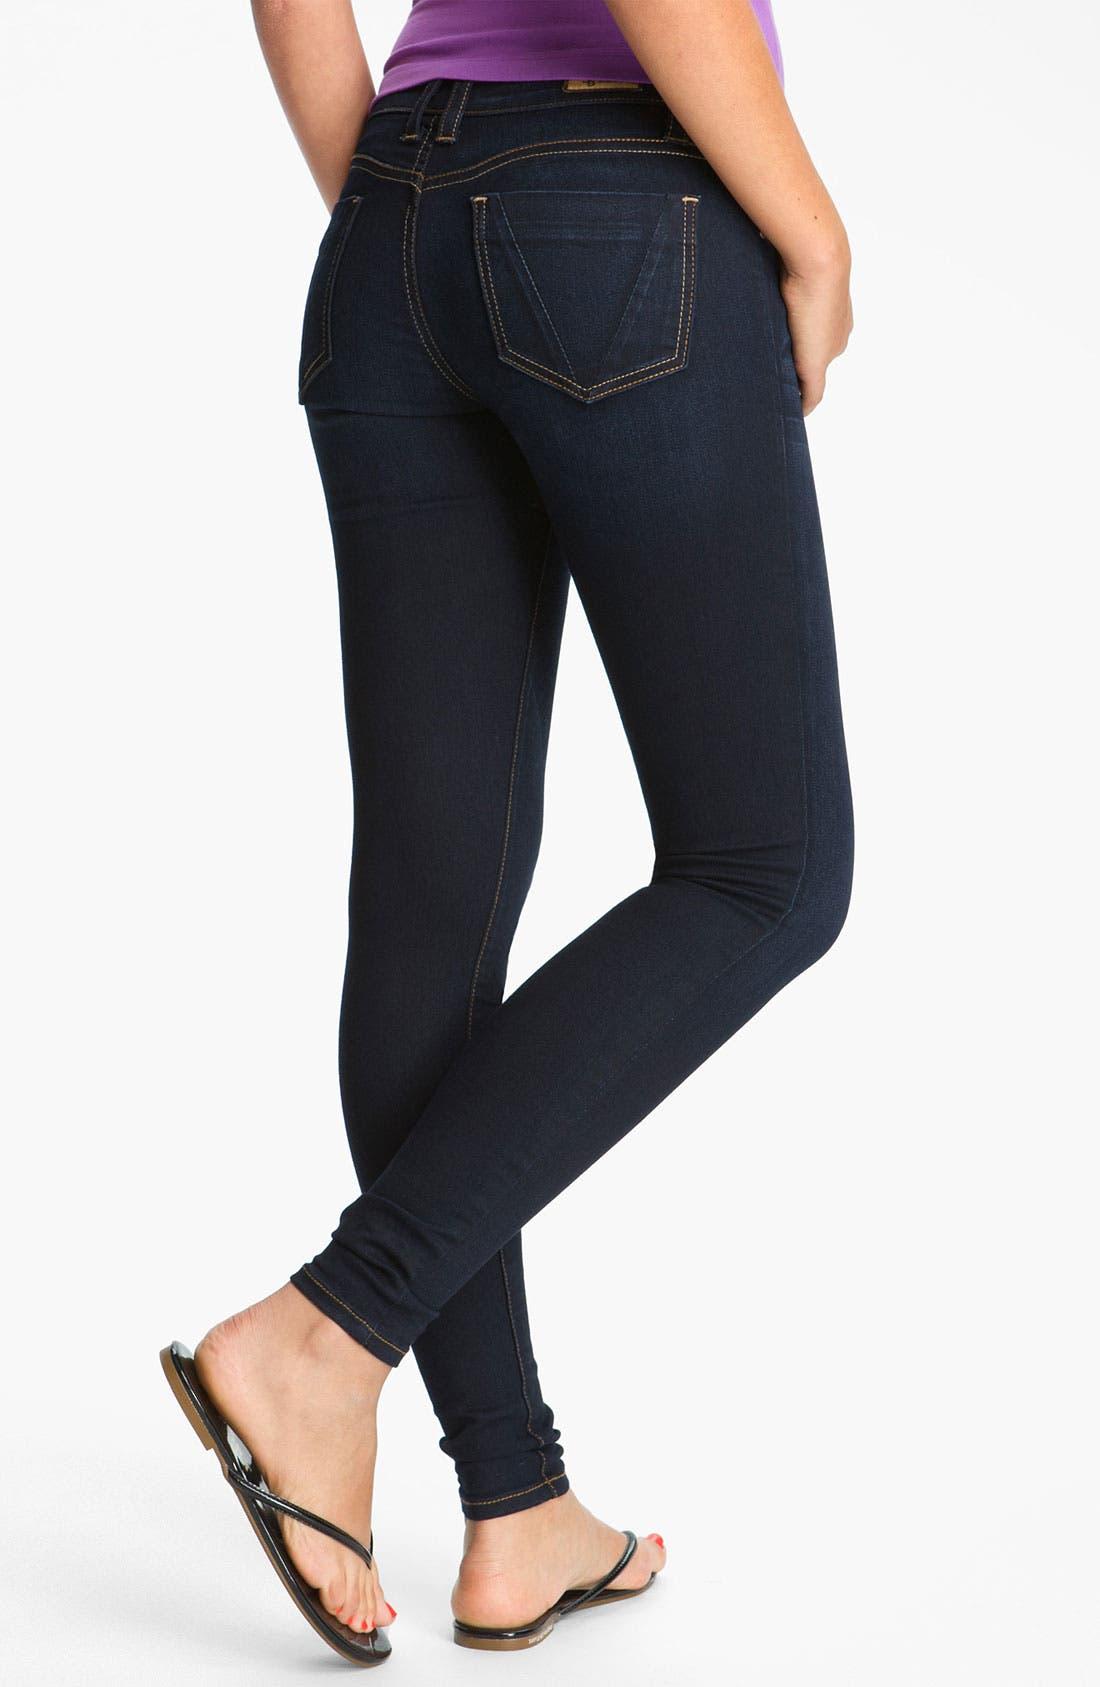 Alternate Image 2  - STS Blue Skinny Jeans (Brisbane Dark) (Juniors) (Online Only)